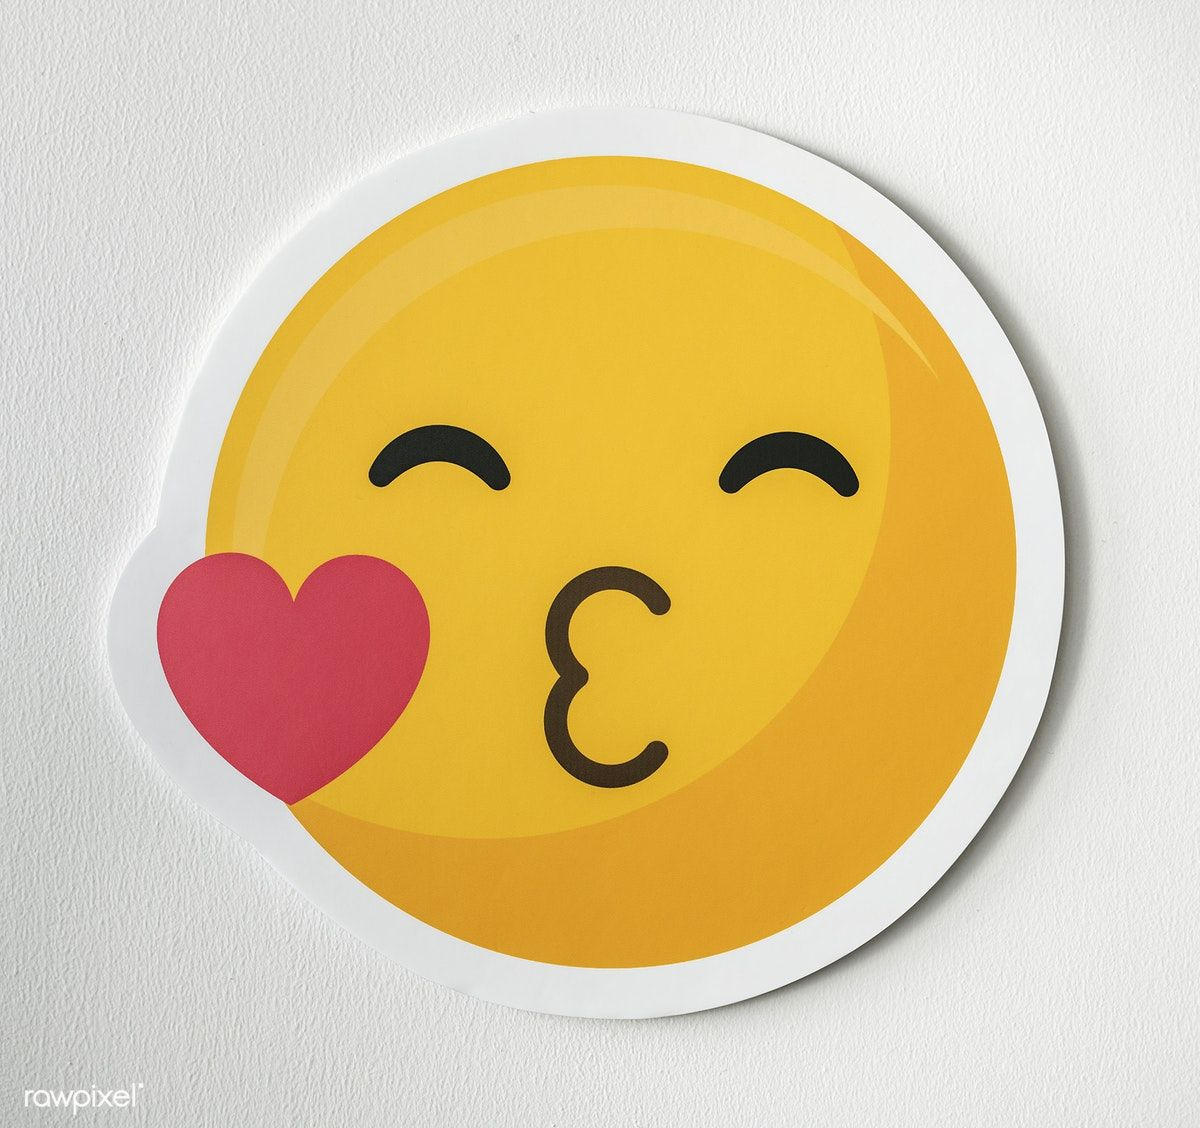 Kissing Face Emoticon Emoji Symbol Free Image By Rawpixel Com Emoji Symbols Emoticon Emoji